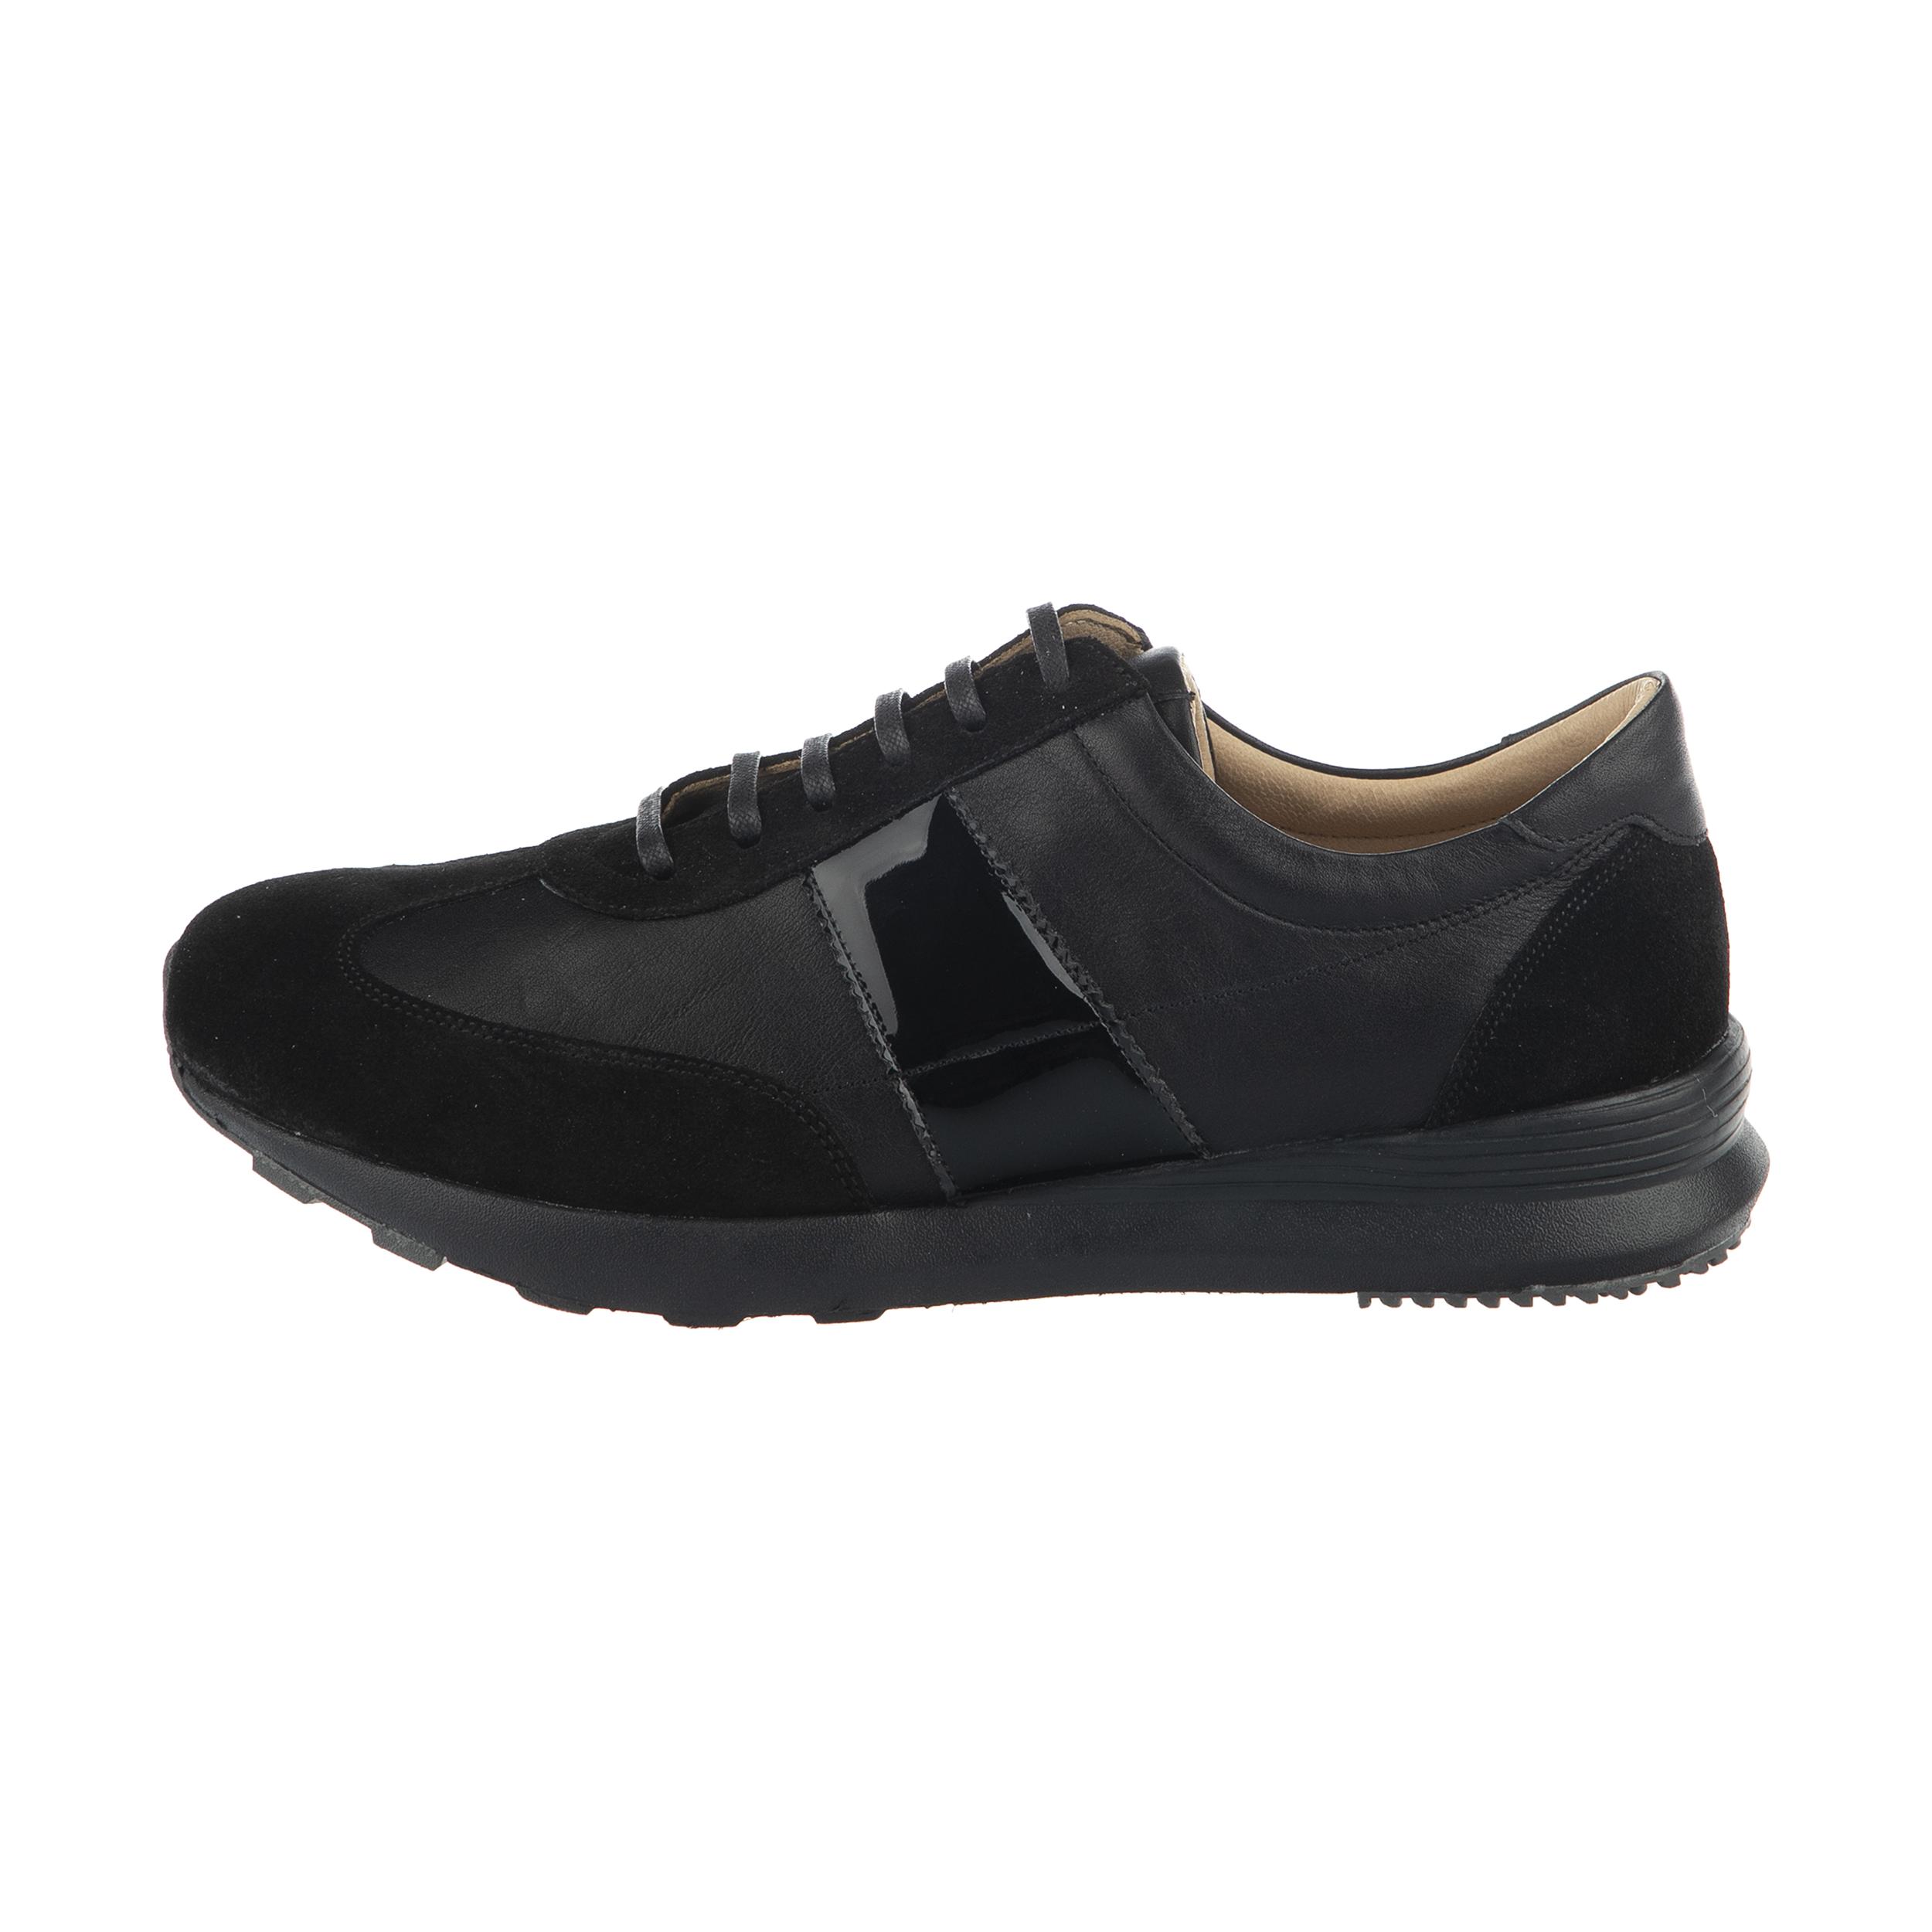 کفش روزمره زنانه برتونیکس مدل 971-27